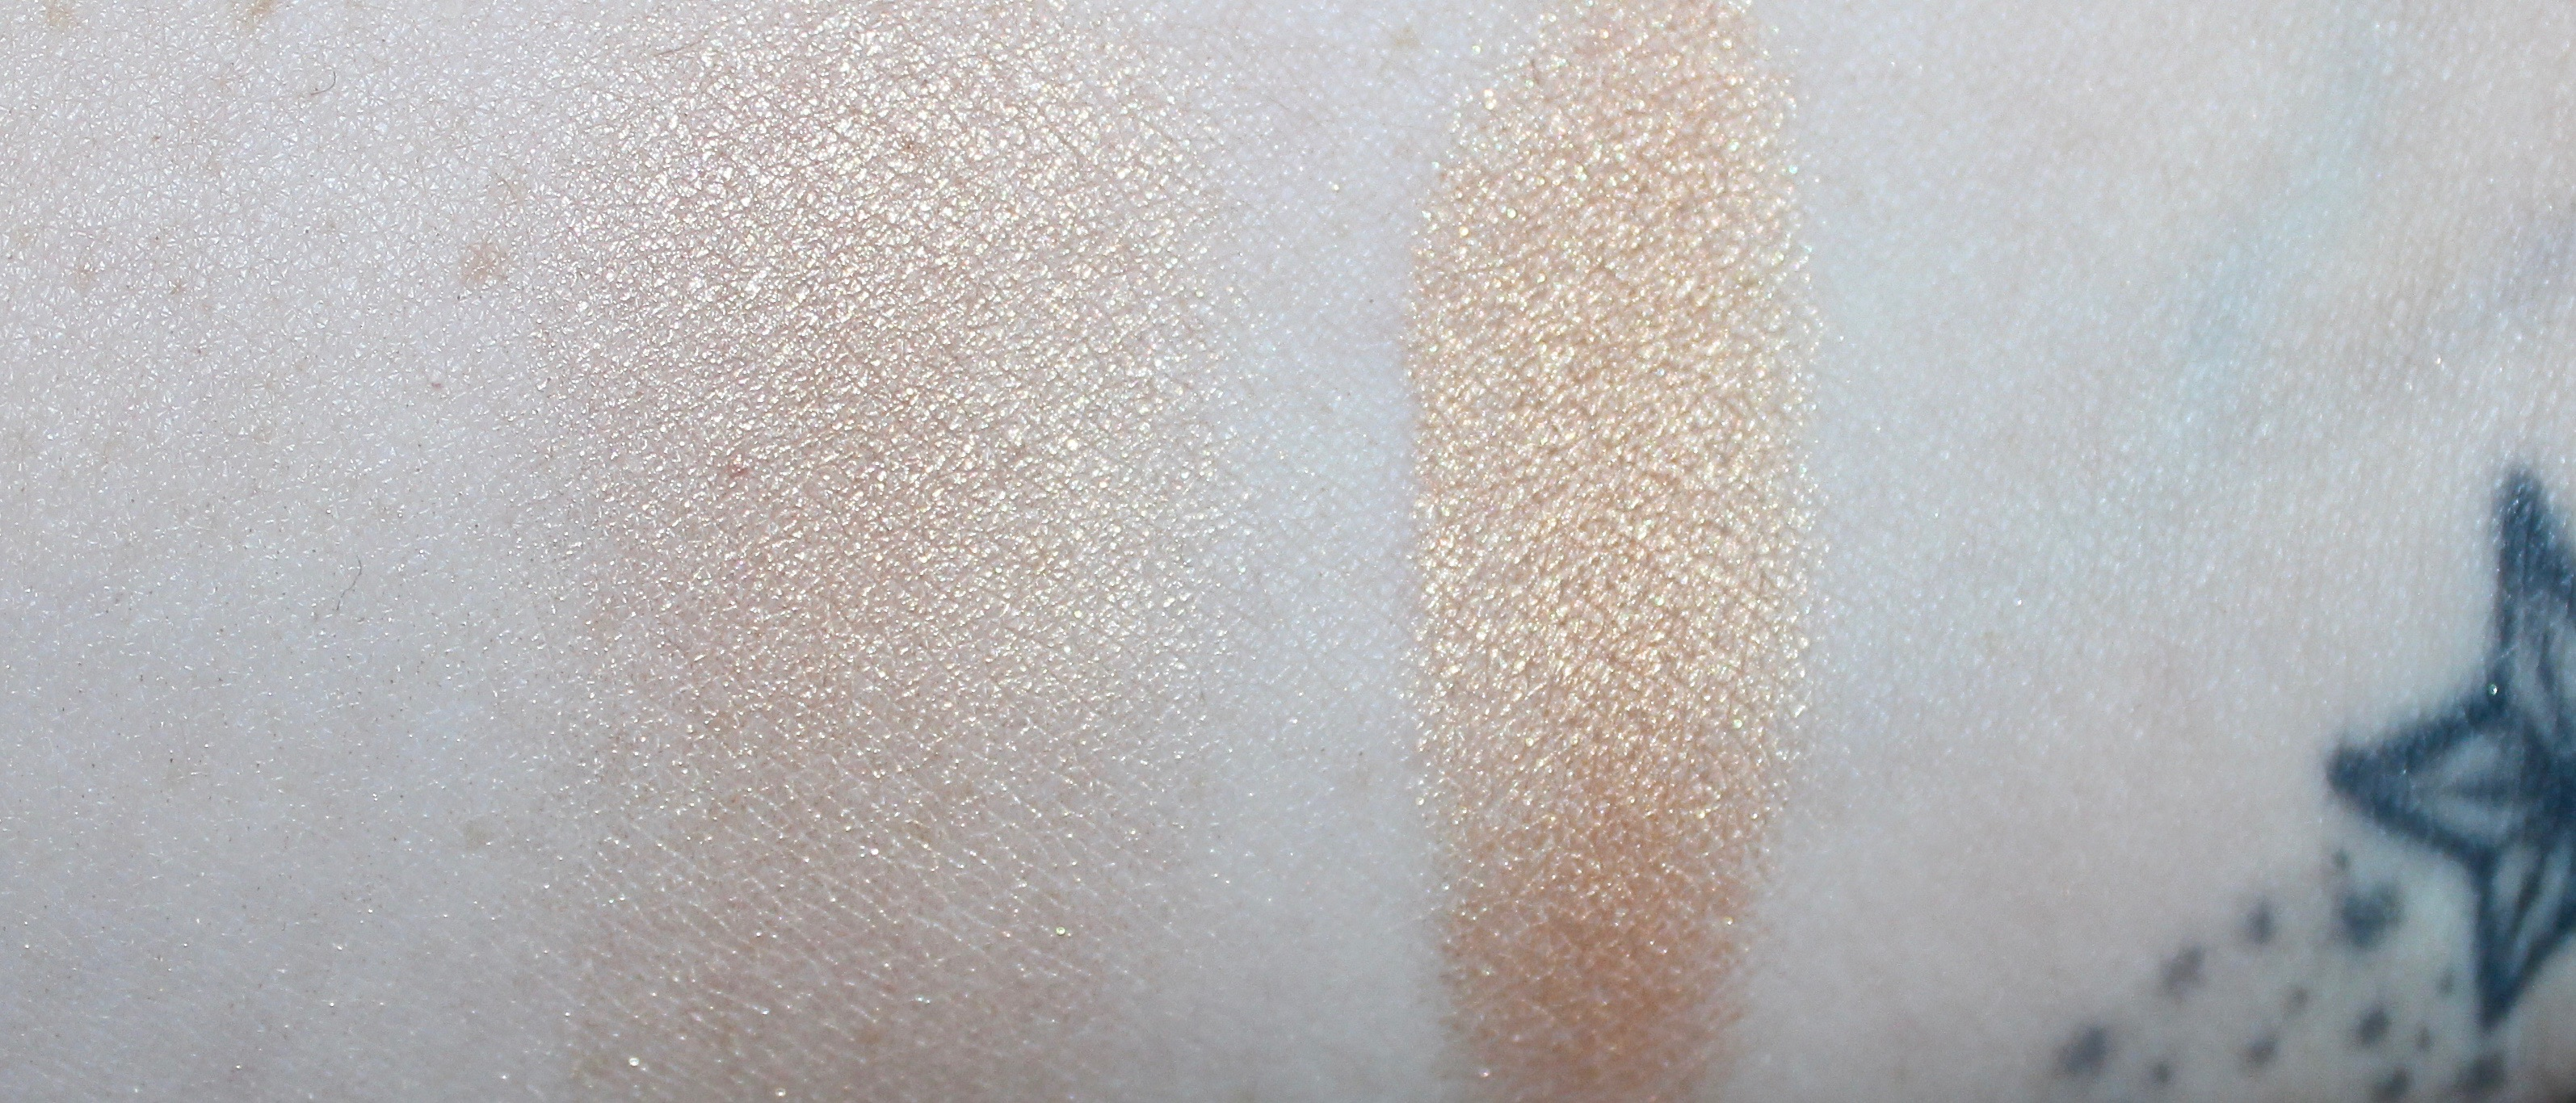 Thebalm Bonnie Lou Manizer Foiled Again Eyeshadow Palette 2428 Irish Beauty Blog Beautynook